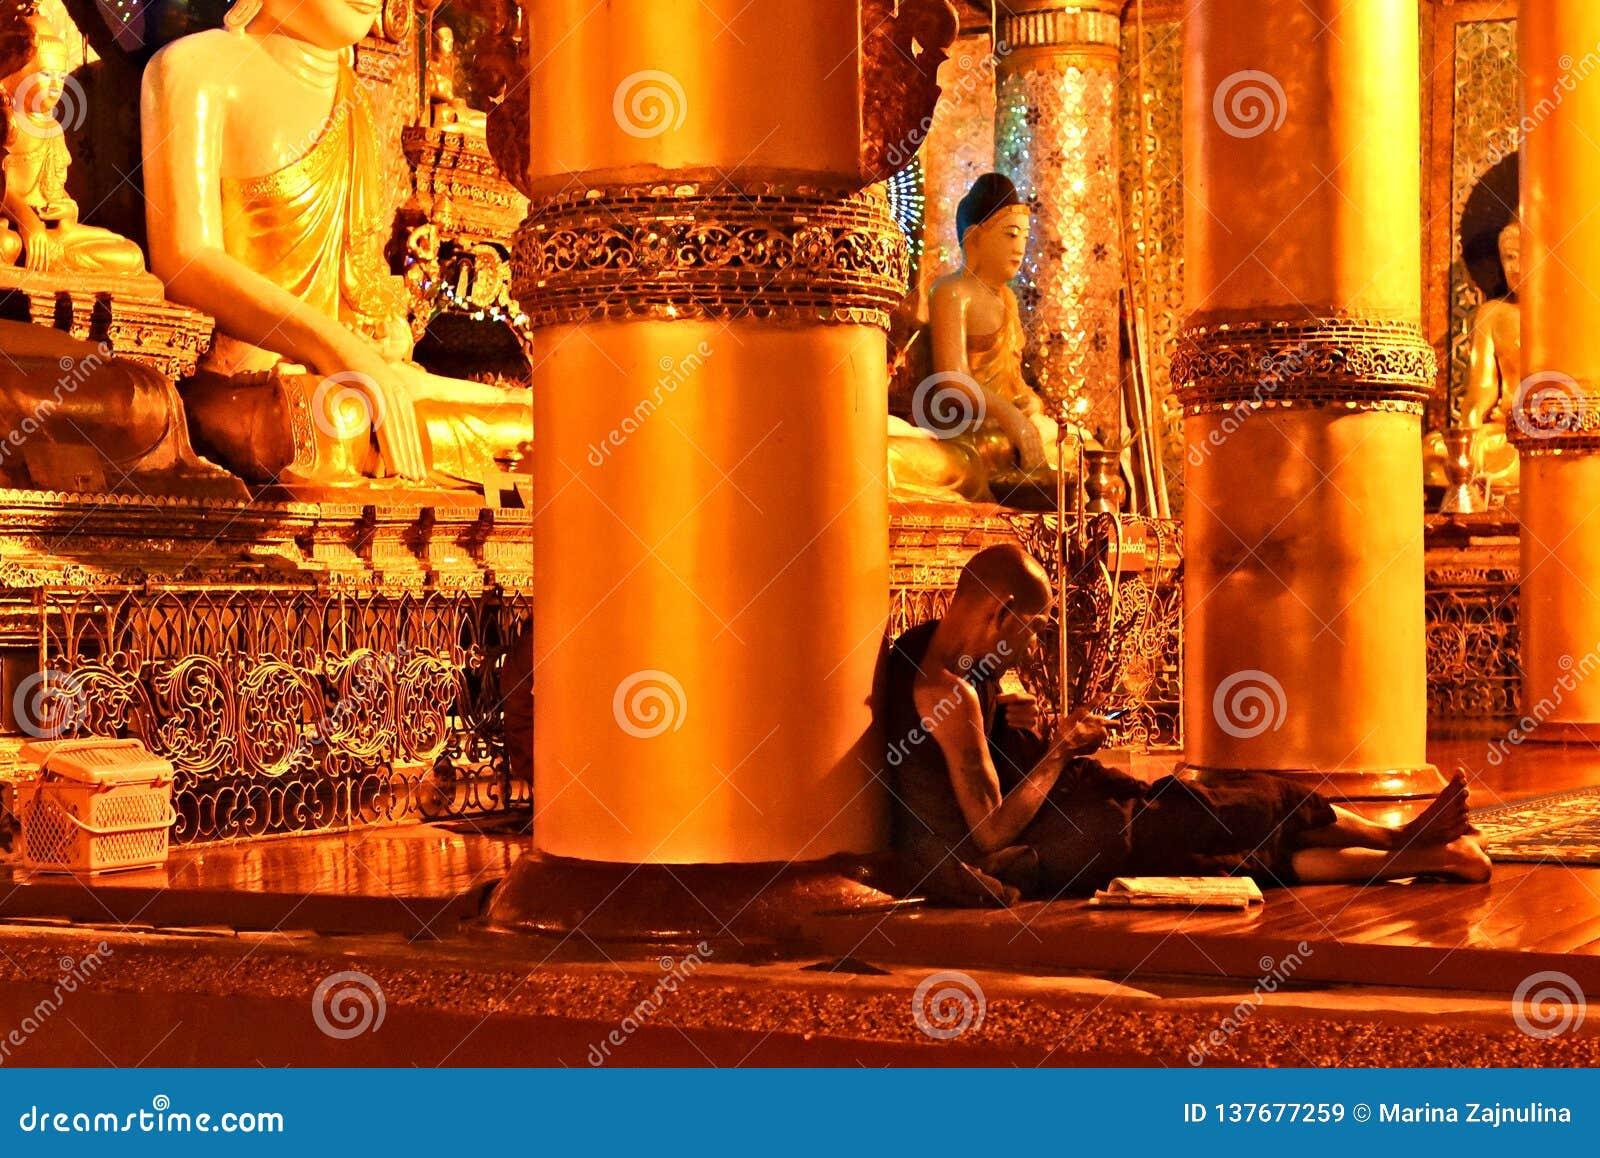 Buddhist Monk Checking His Smartphone at Shwedagon Pagoda in Yangon